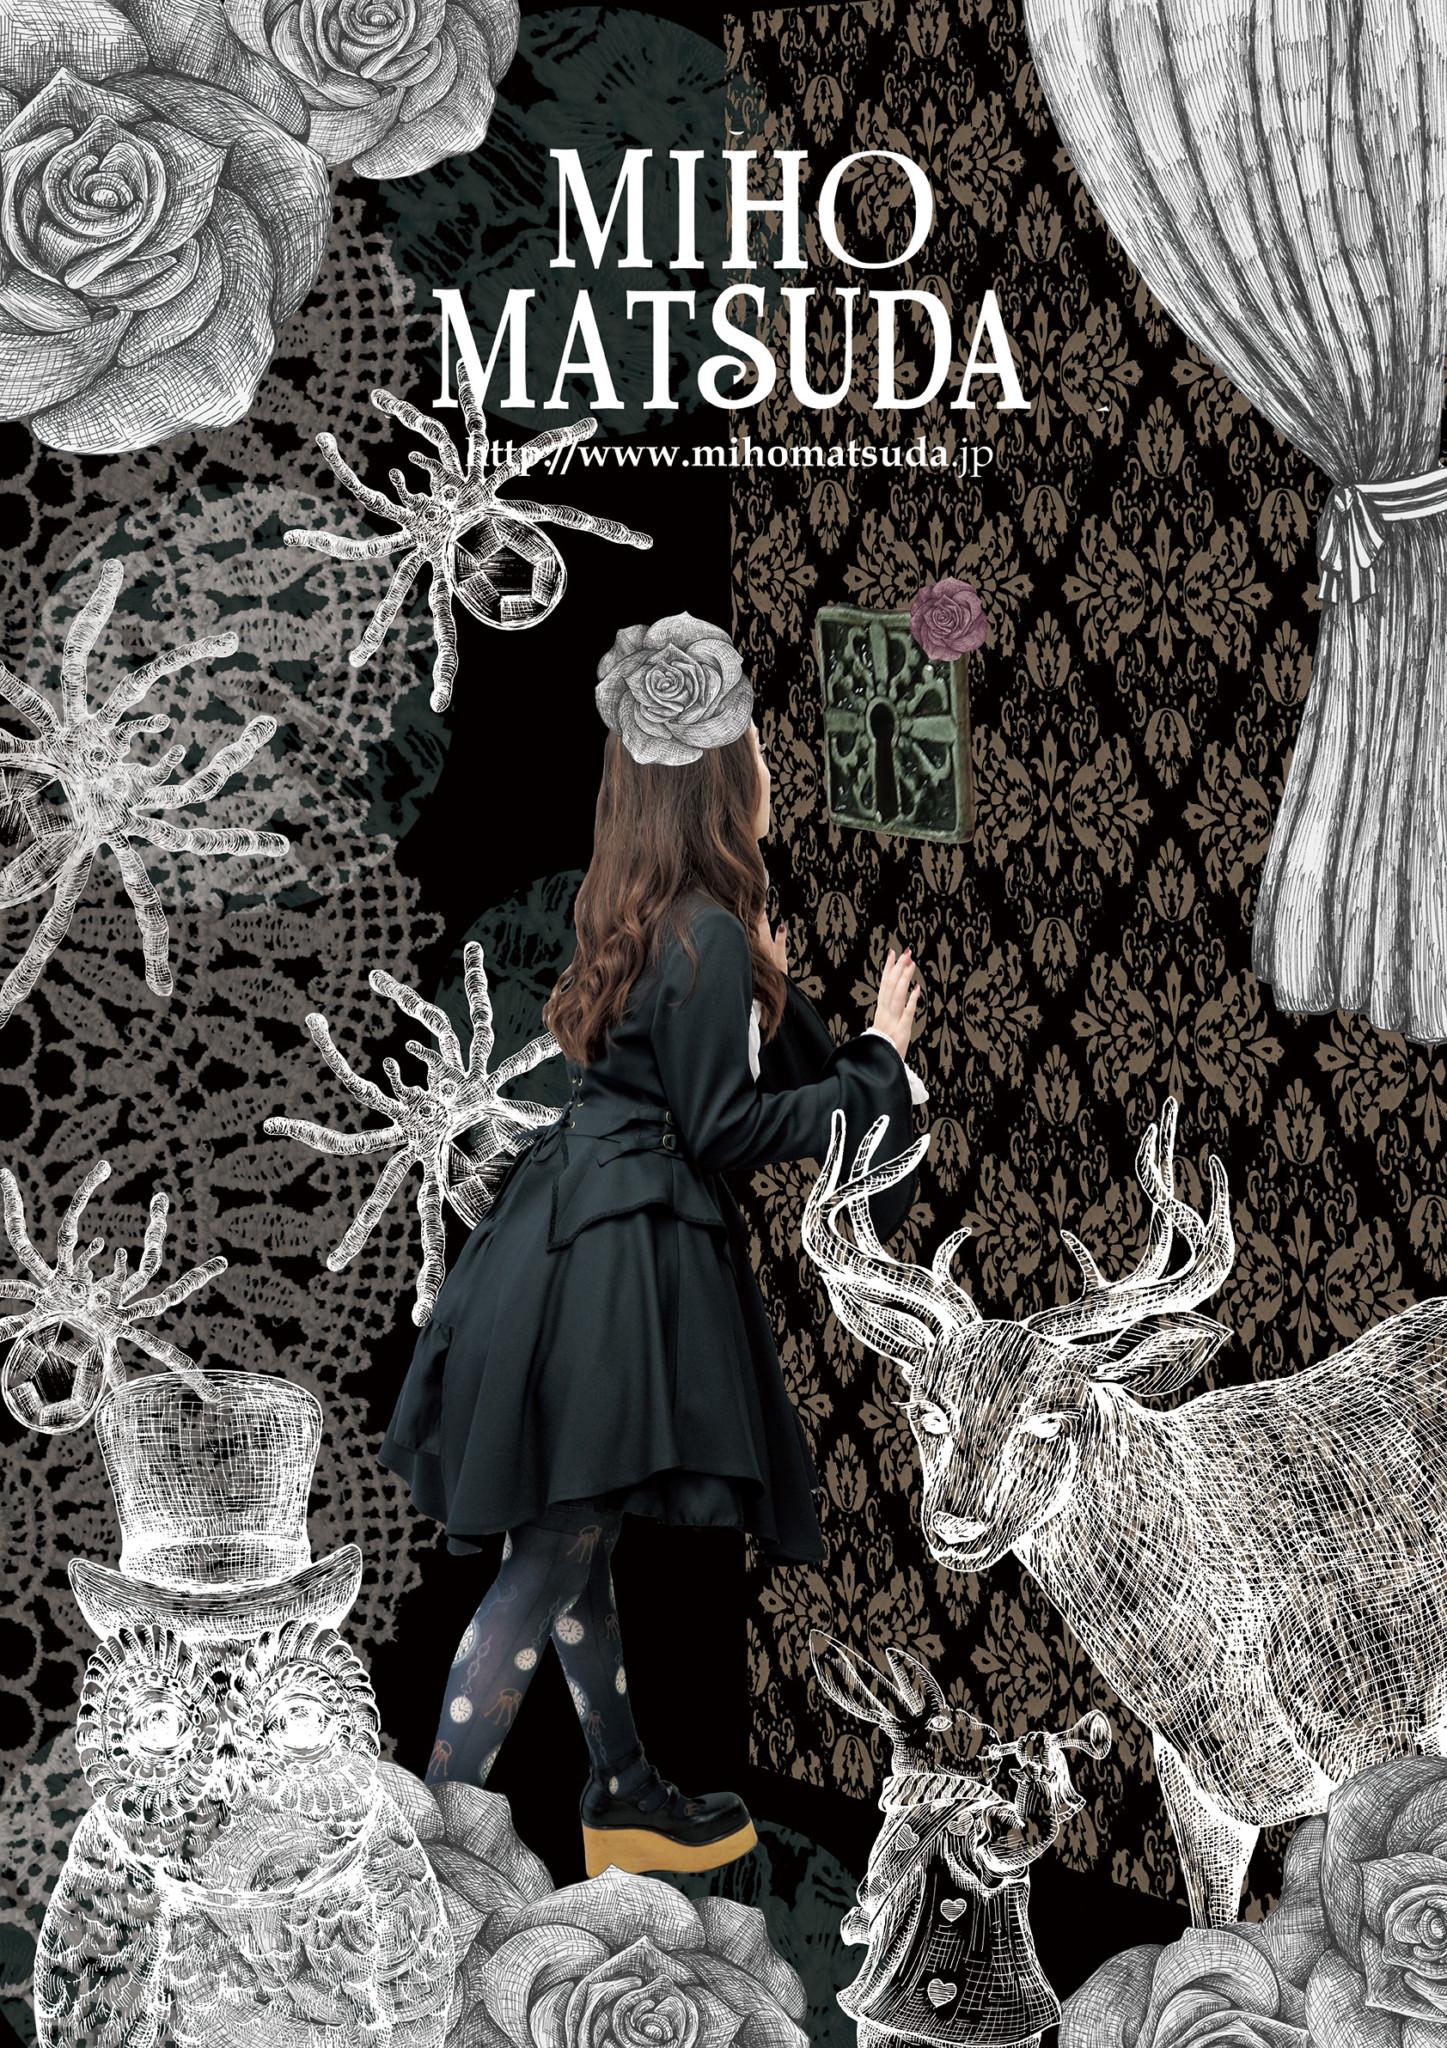 MIHO MATSUDA